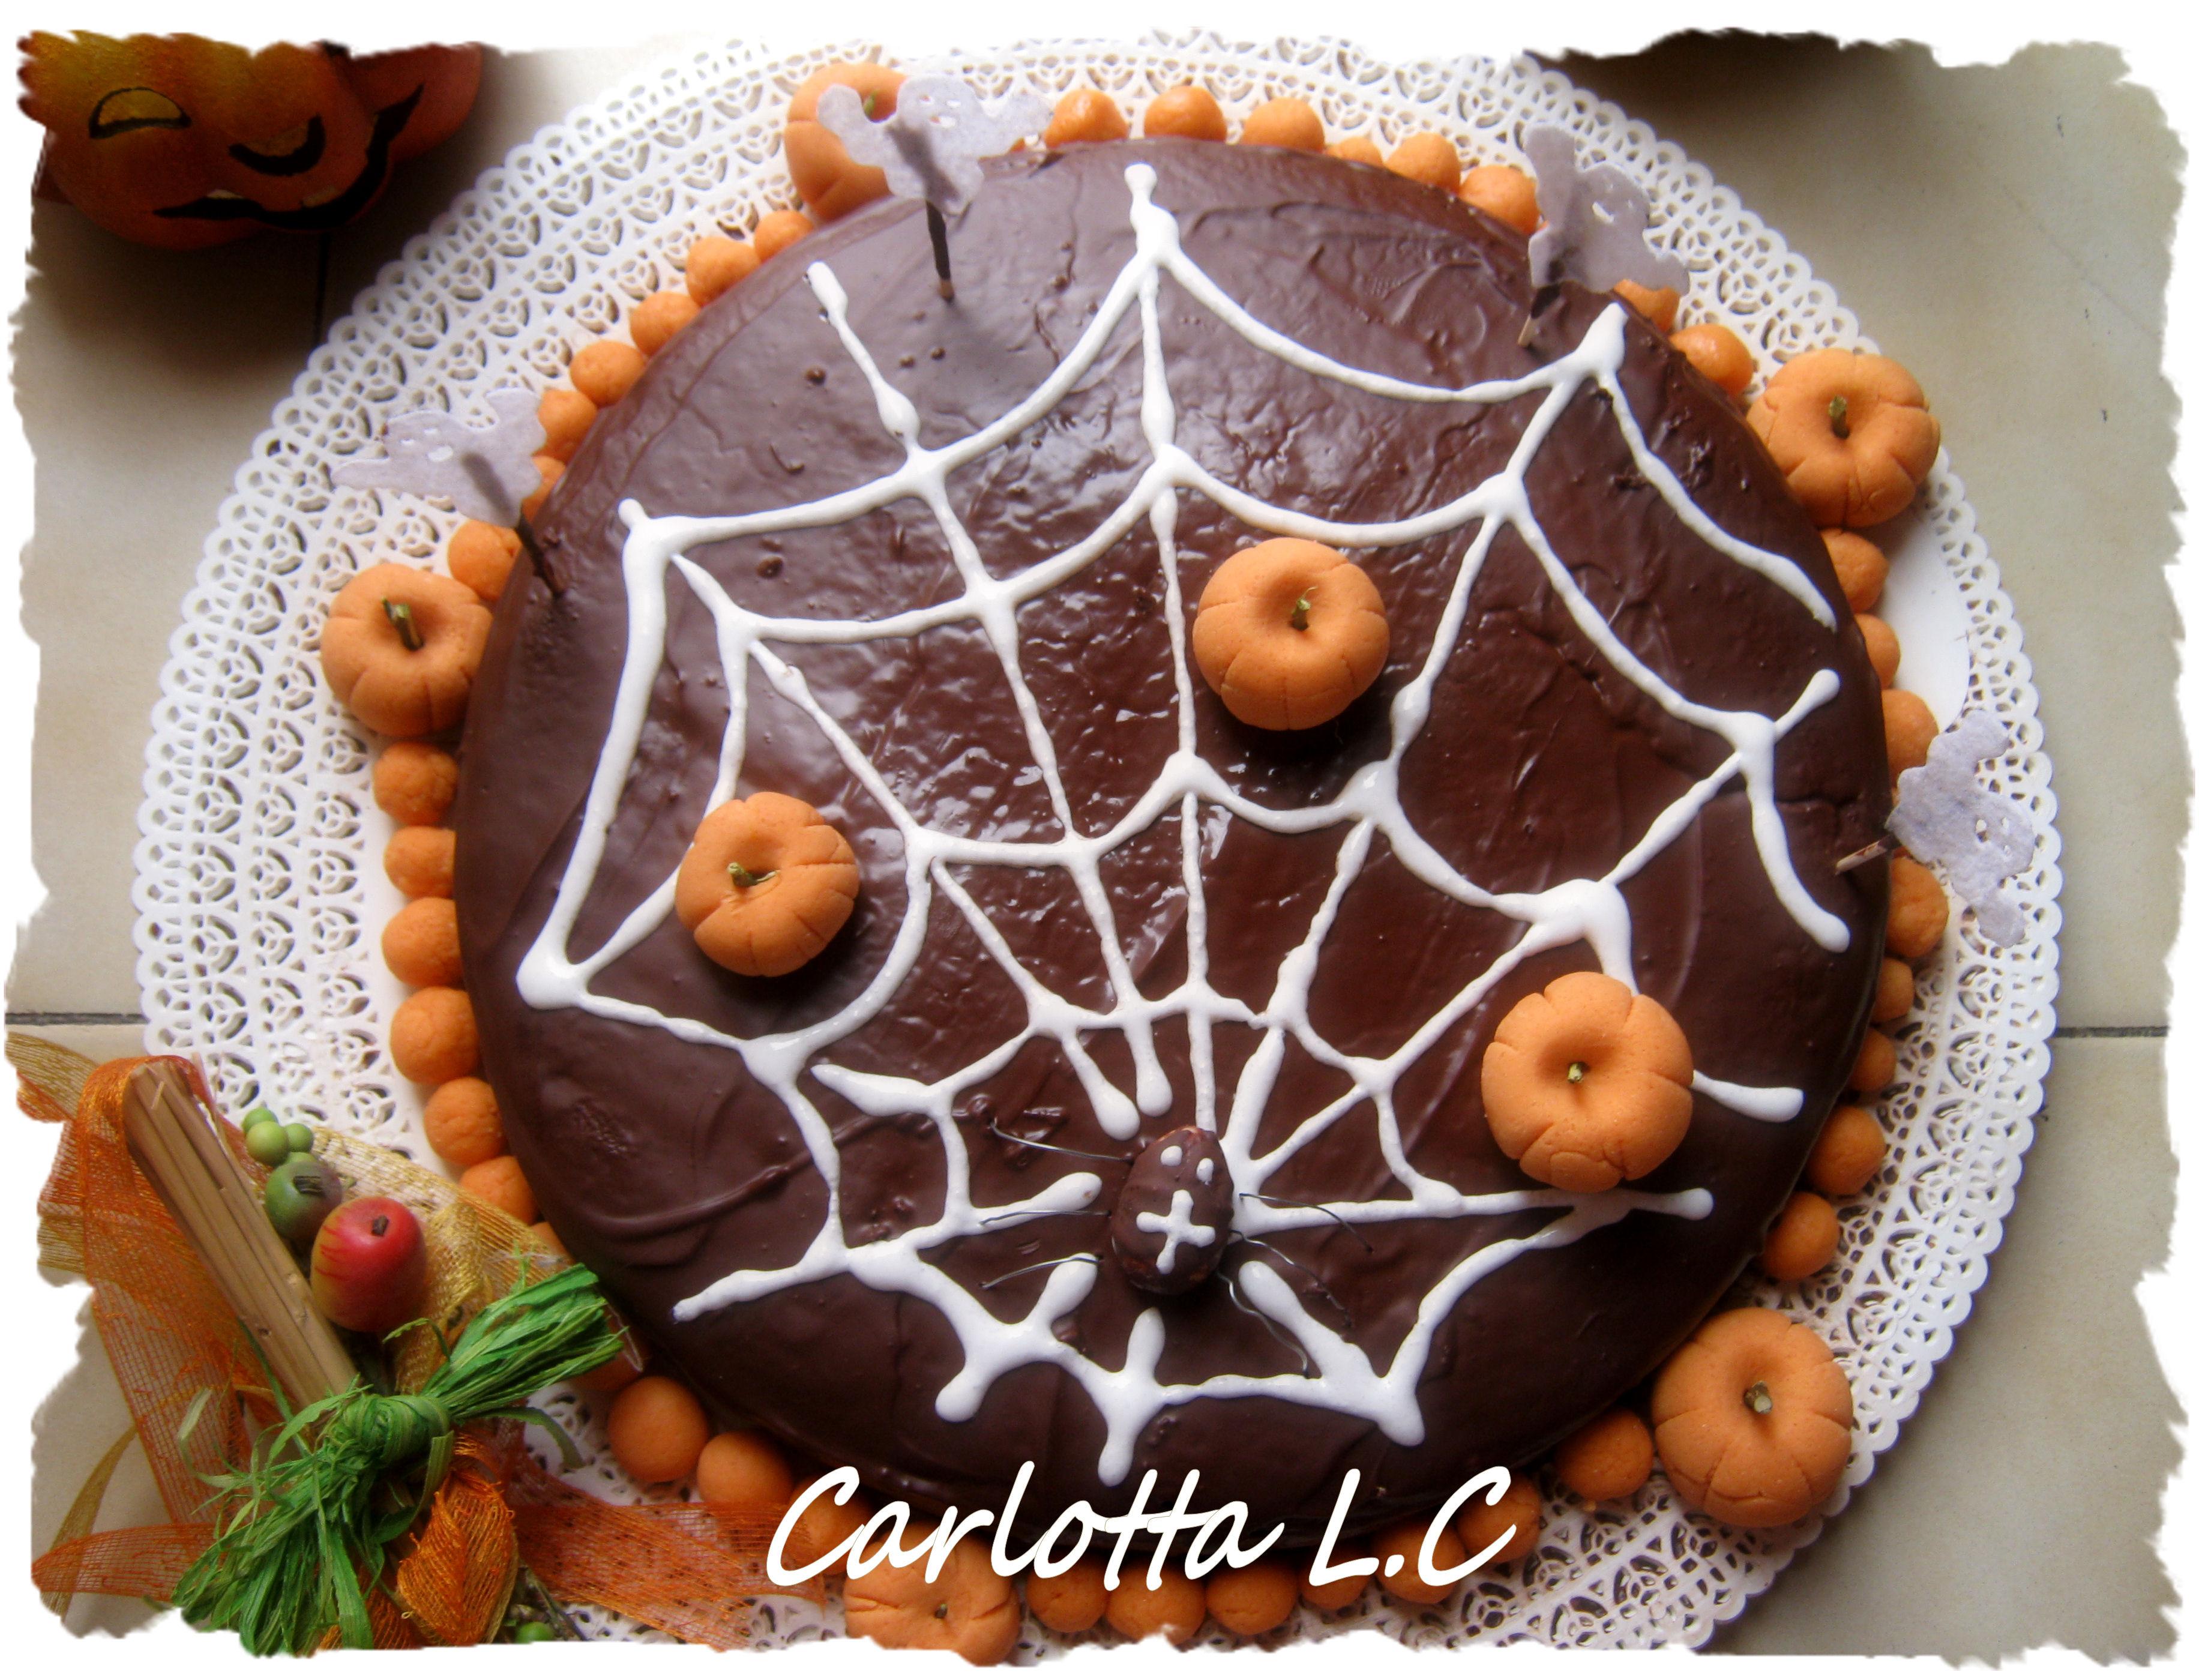 Halloween decorazioni torte - Decorazioni per torte di carnevale ...